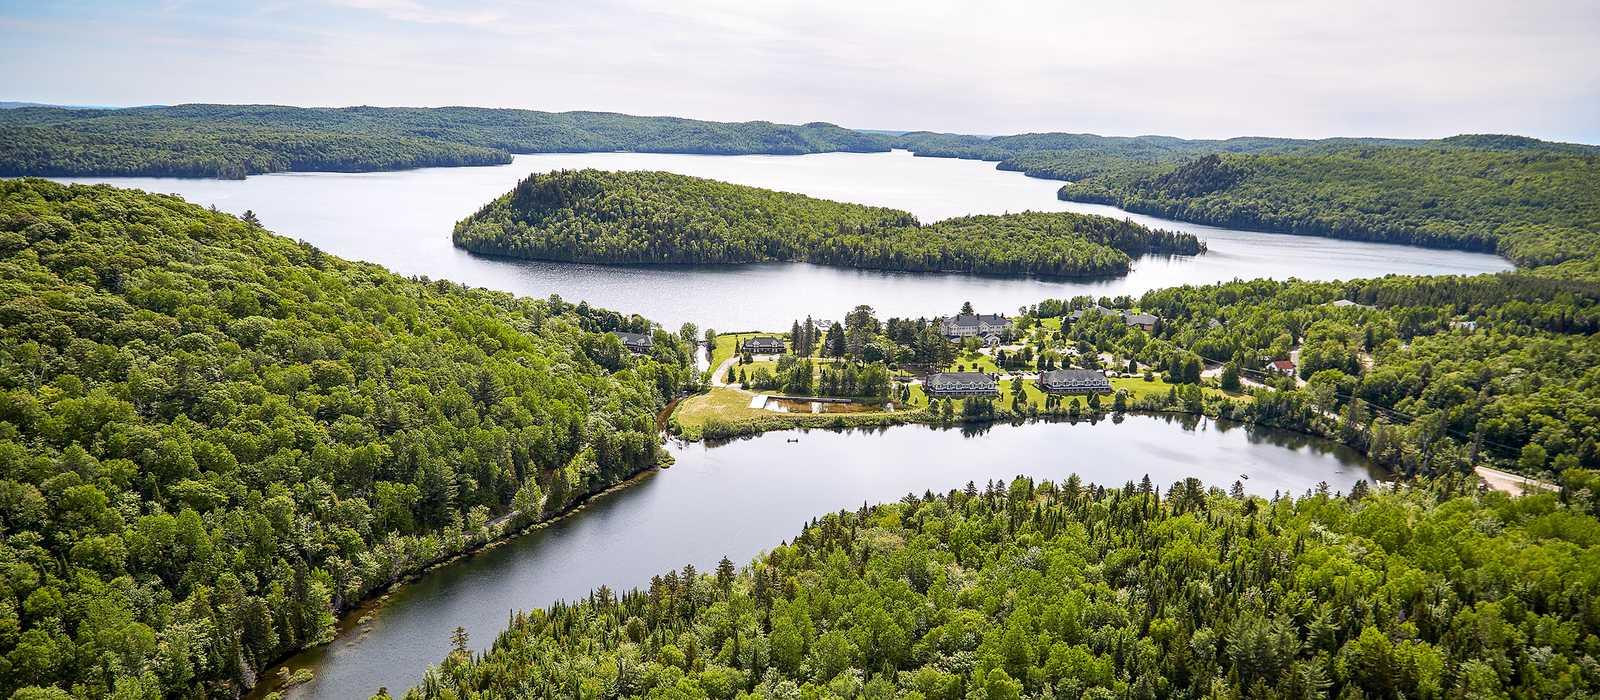 Luftaufnahme vom Hotel du Lac-à-l'Eau Claire in Quebec, Kanada